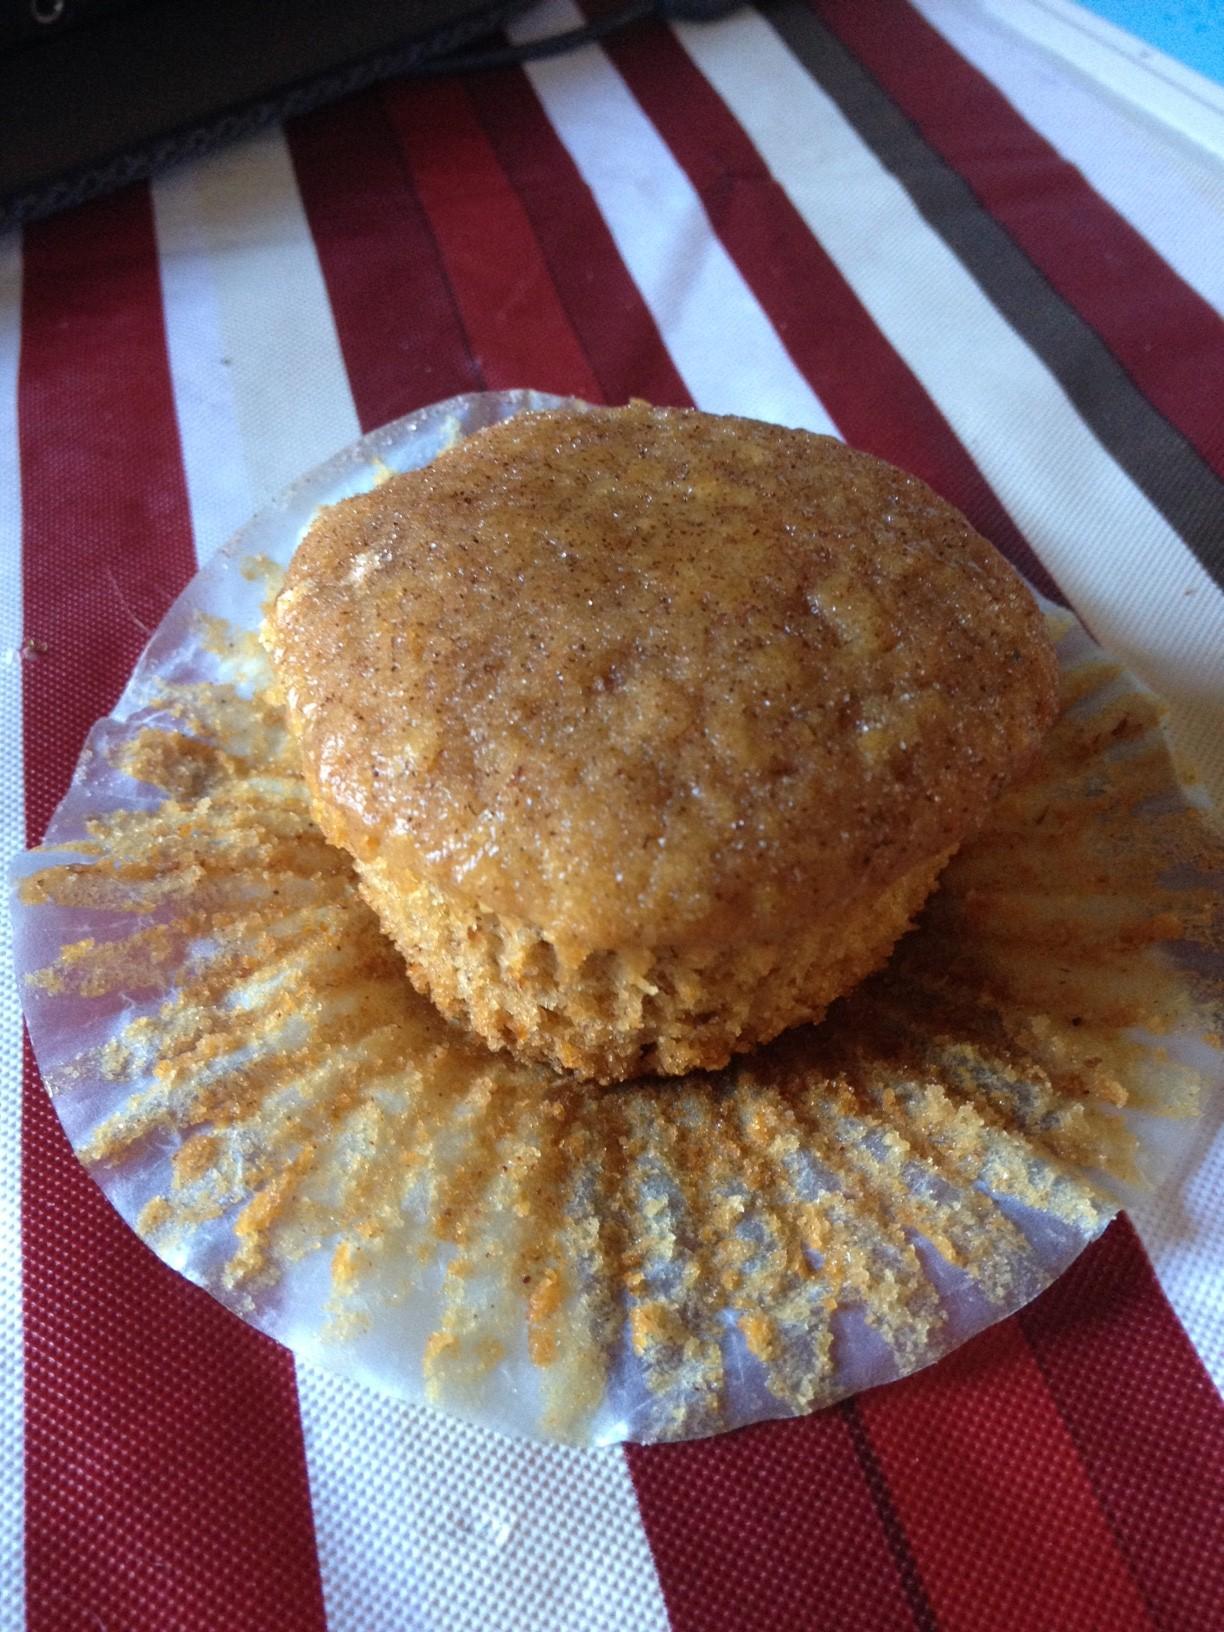 Apple Cinnamon Spice Amish Friendship Bread Muffin by Catie LaRocca | friendshipbreadkitchen.com